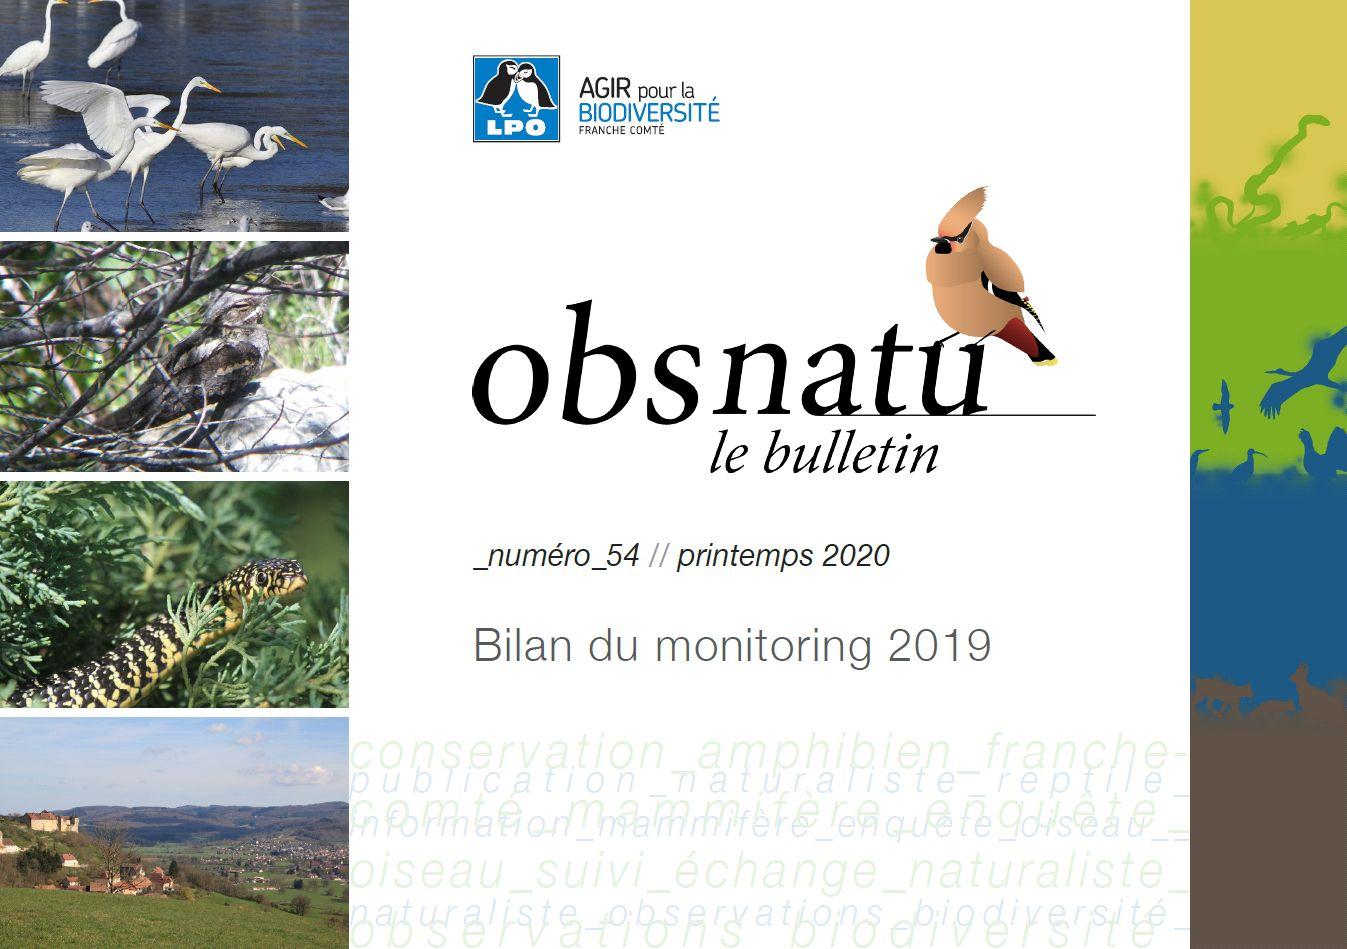 https://cdnfiles1.biolovision.net/franche-comte.lpo.fr/userfiles/publications/Obsnatubulls/Obsnatun54print2020couv.jpg